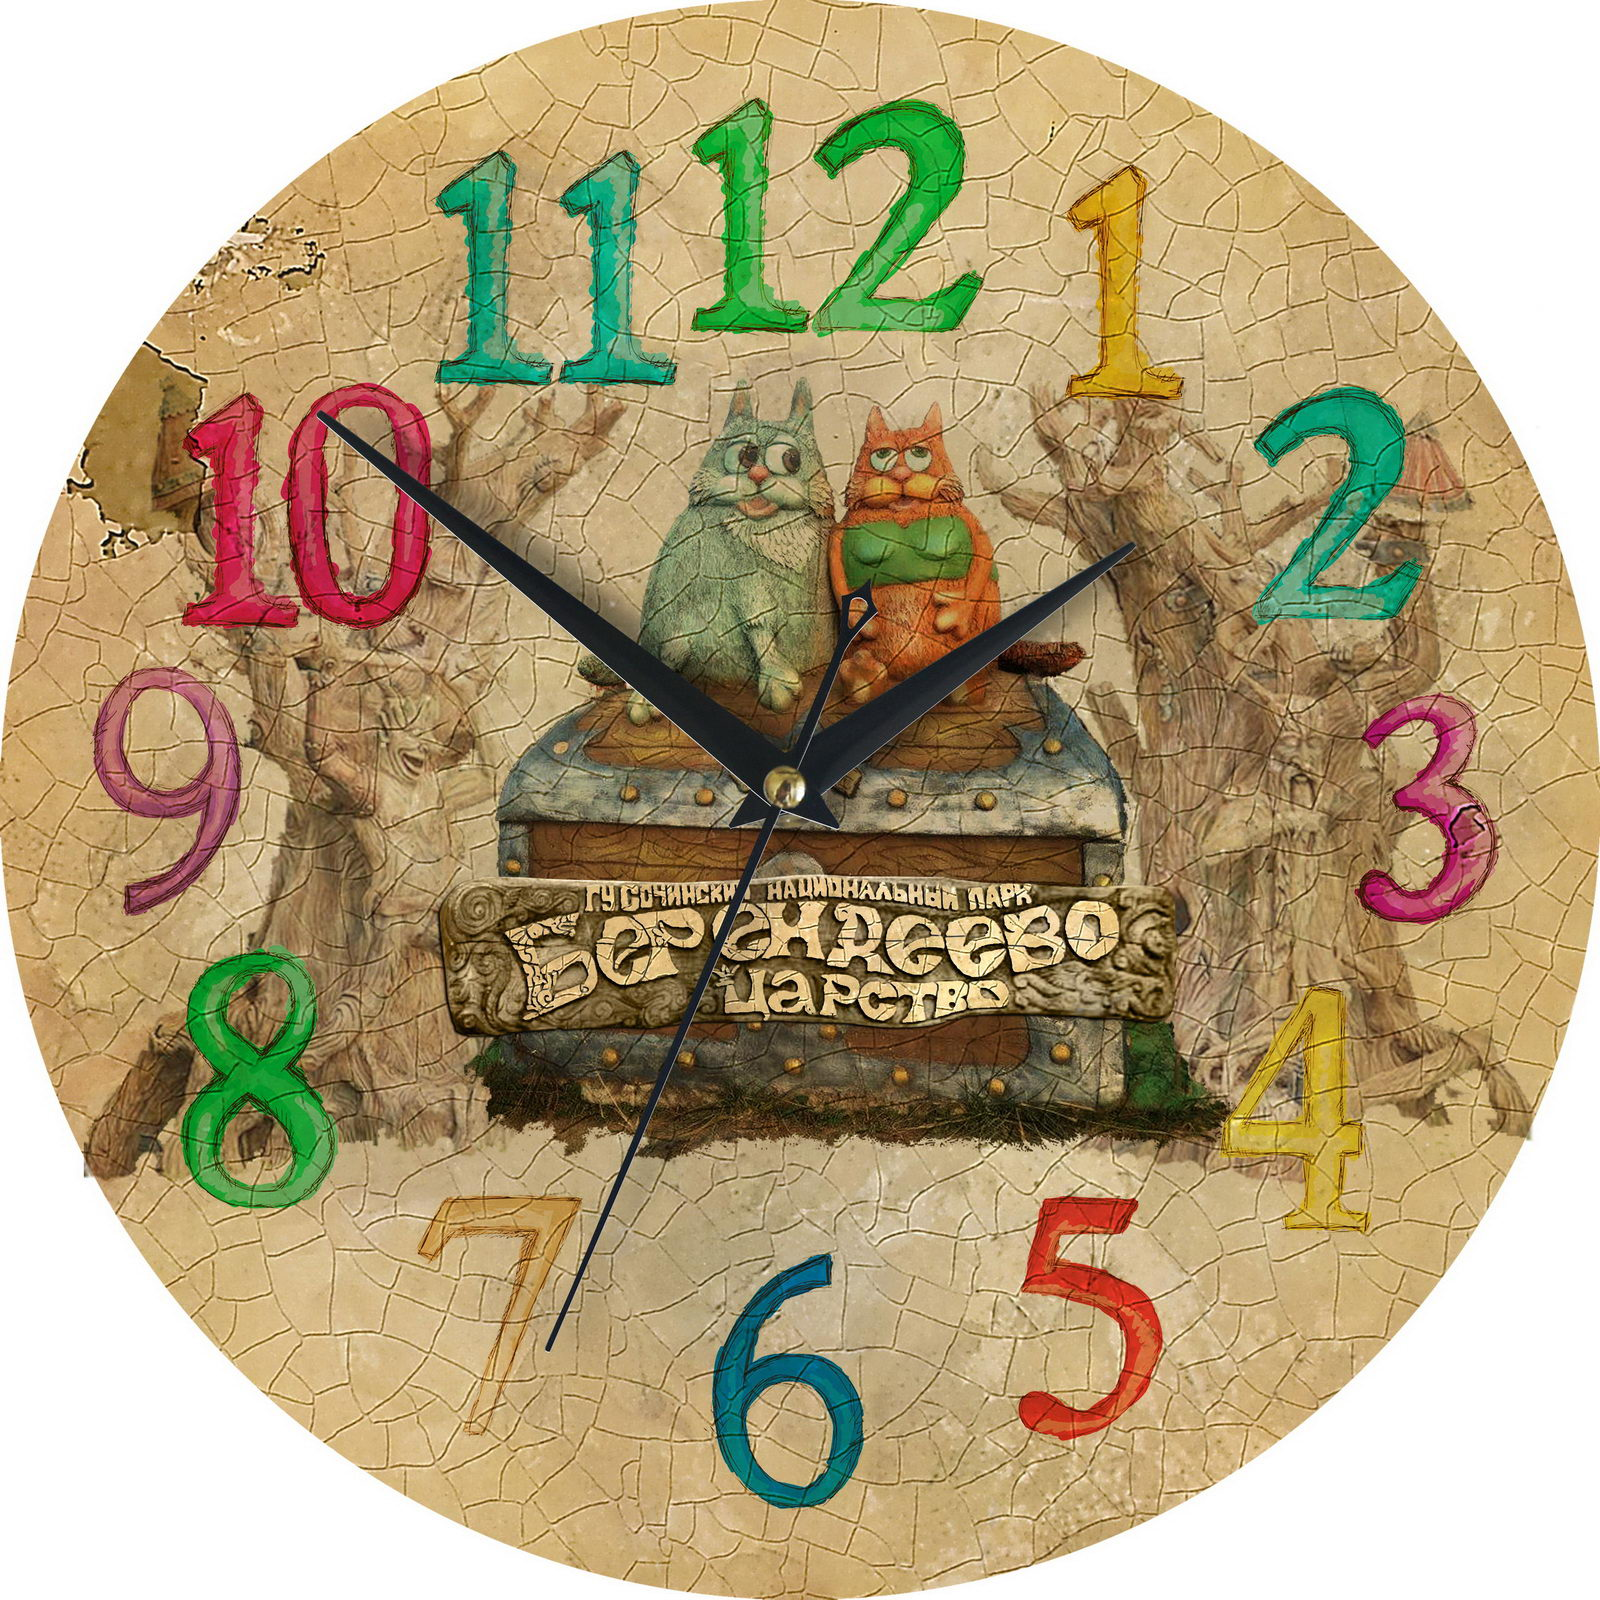 Часы сувенир Сочи Берендеево царство